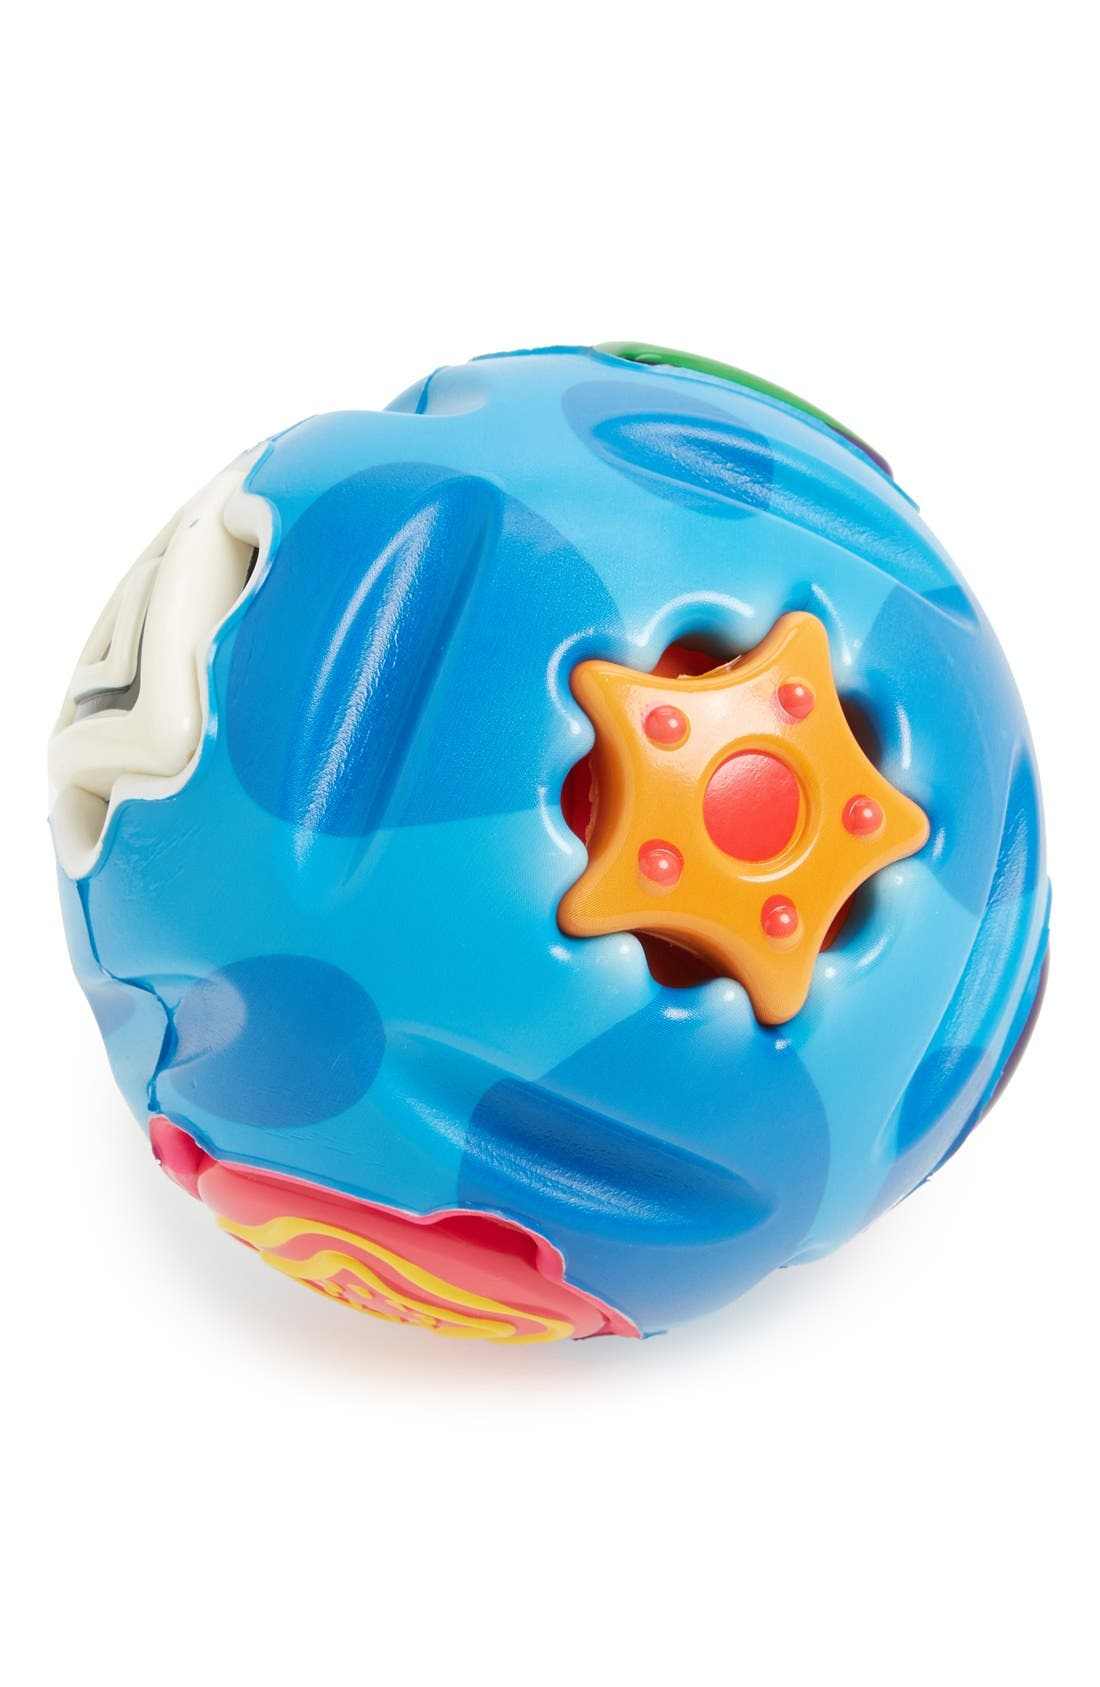 Hedstrom Sensory Shapes Ball Toy